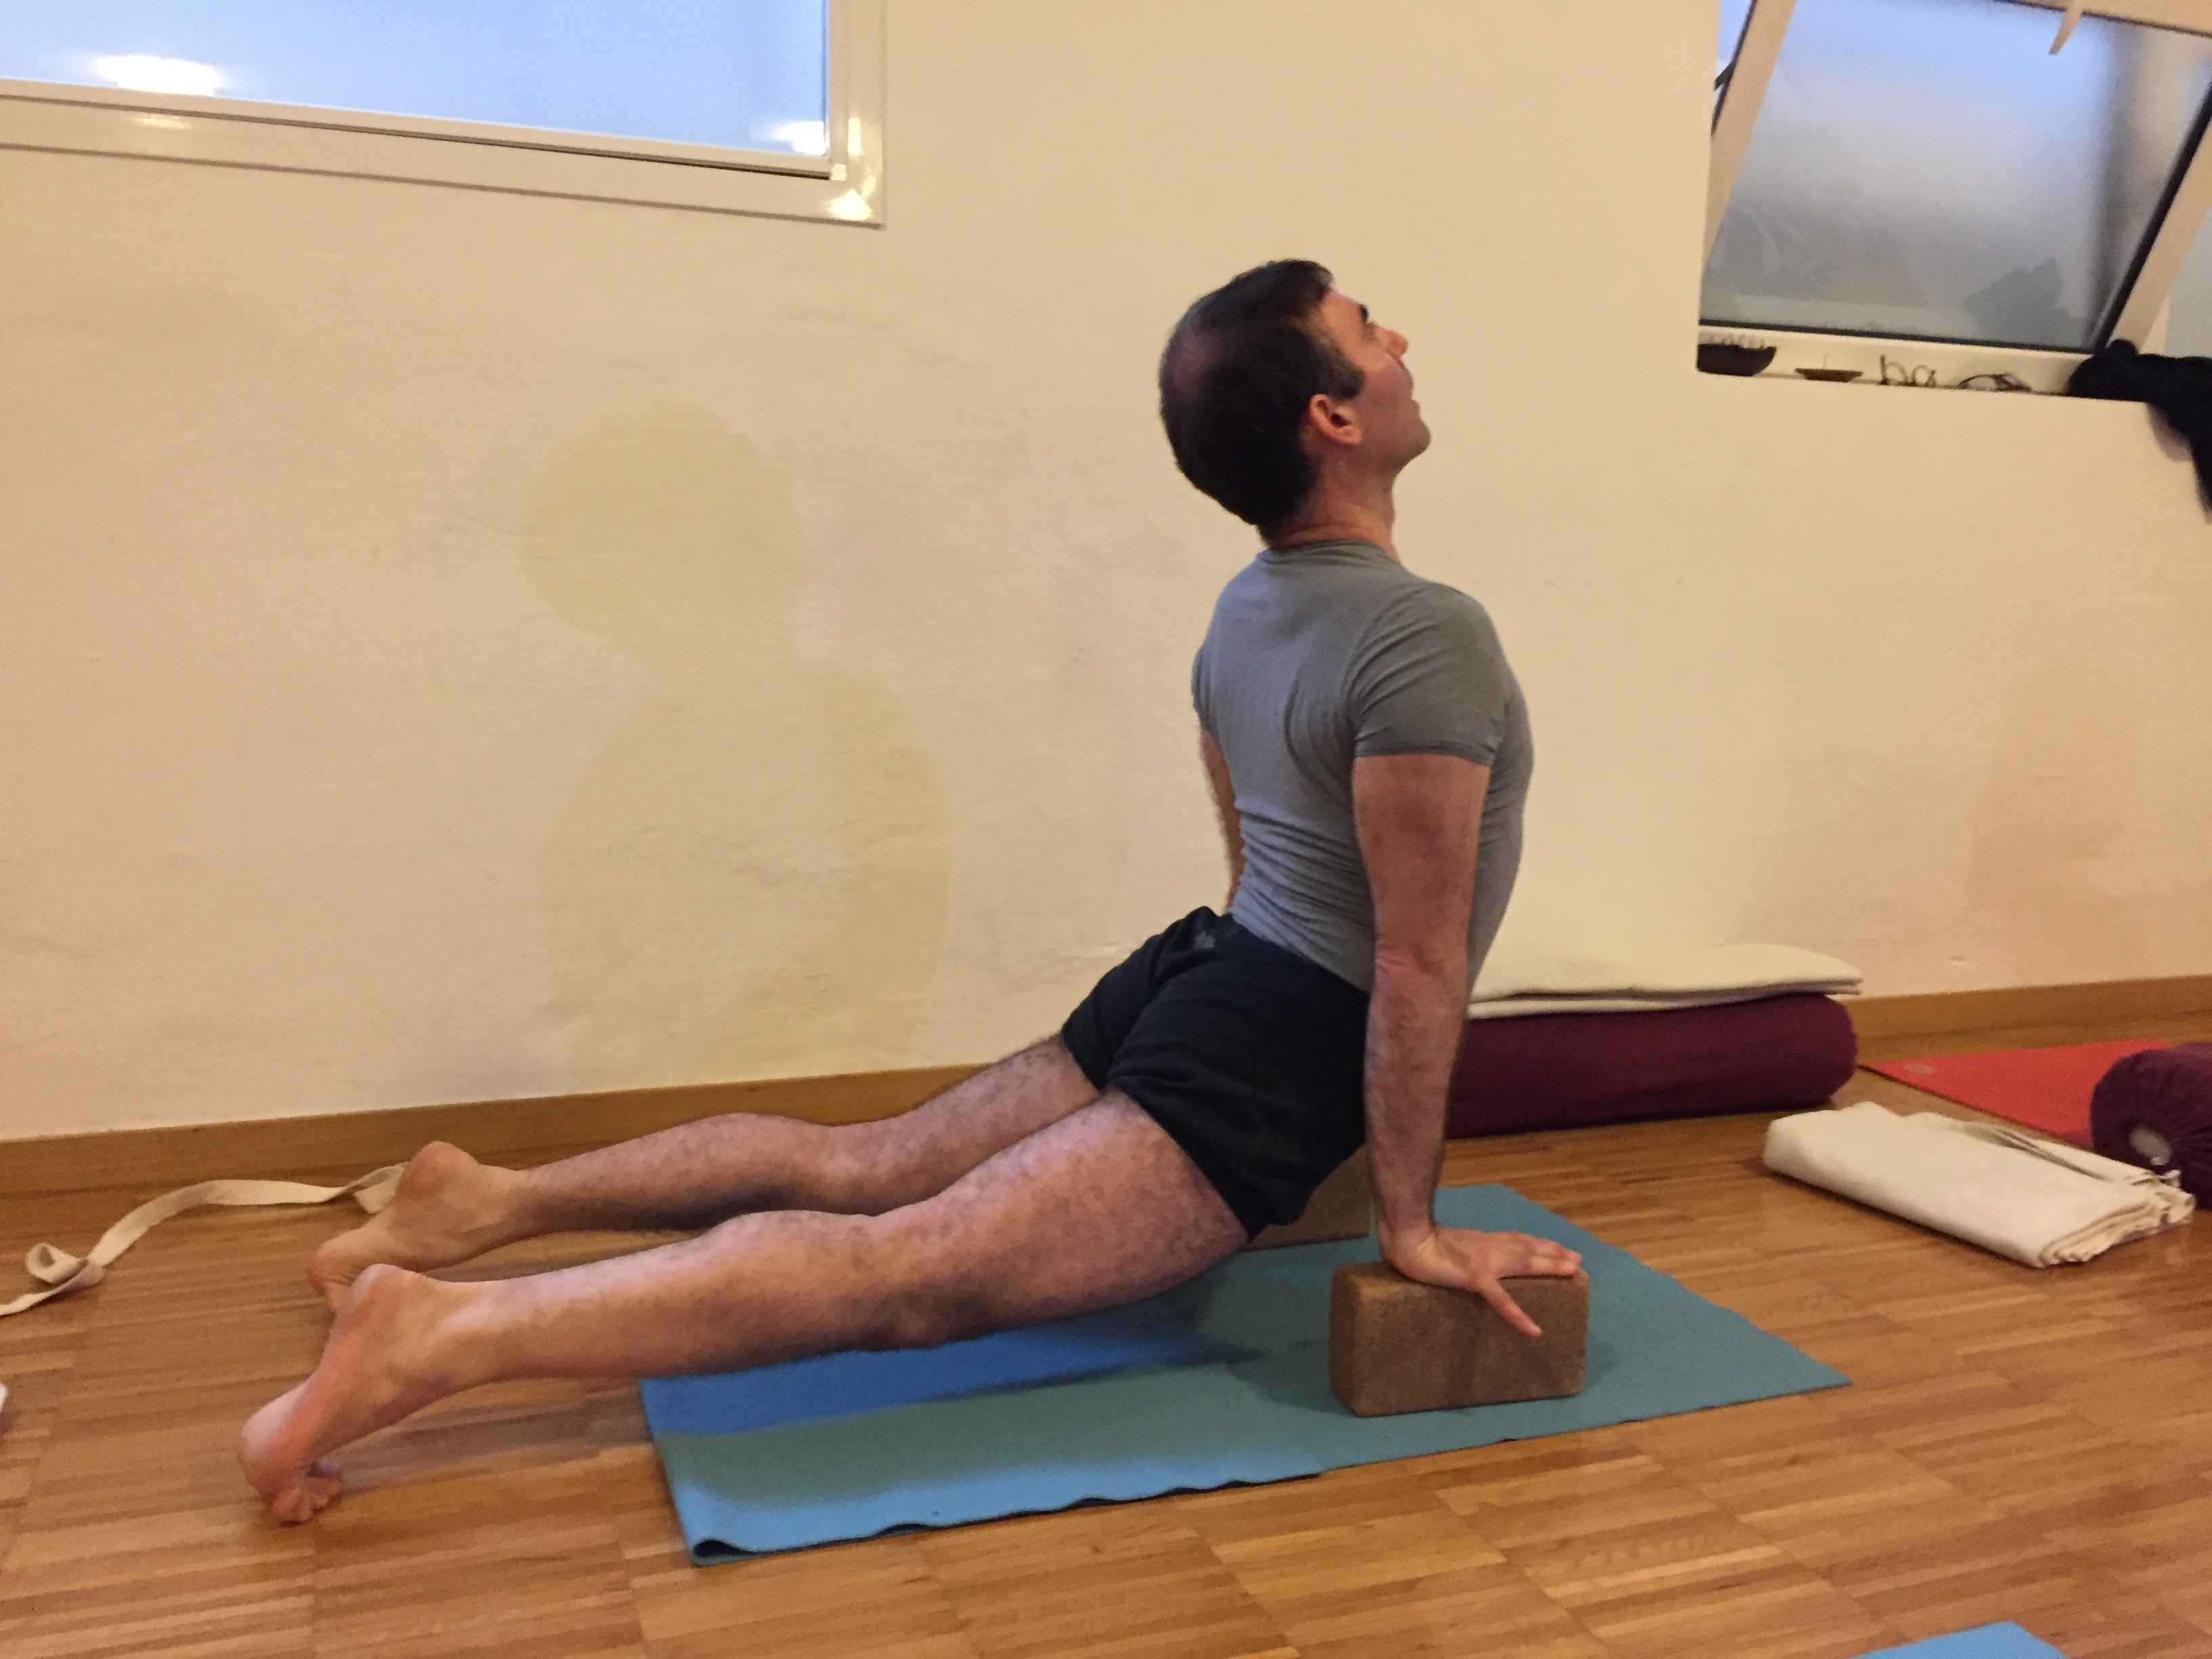 Best Yoga Mat 2020.Workshop With David Meloni 2020